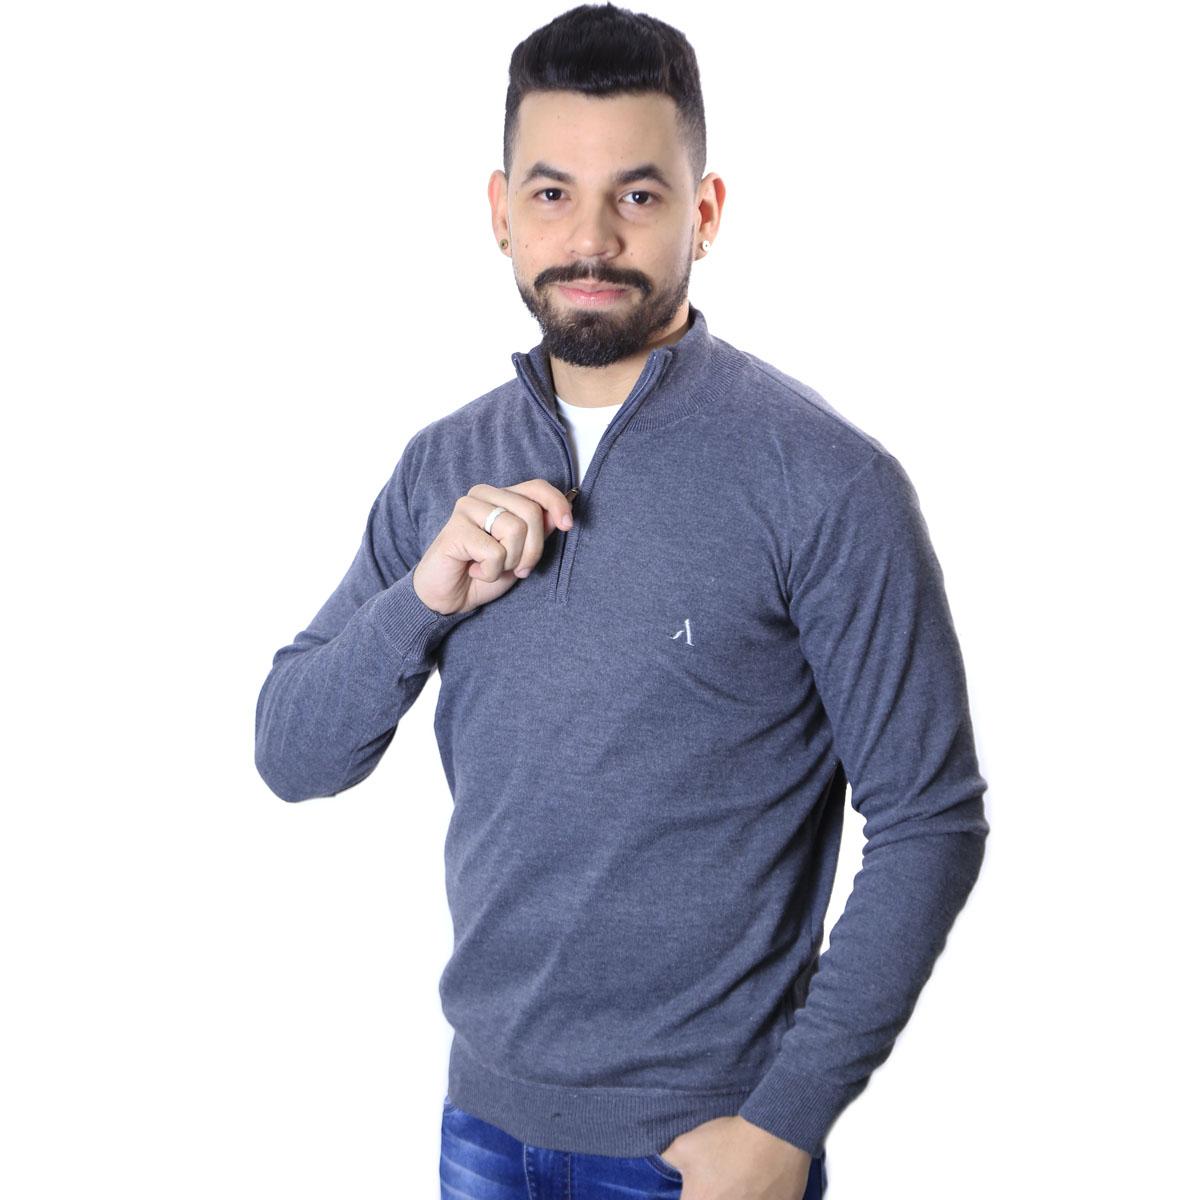 Suéter Agricio Meio Ziper Basico Cinza Escuro Mescla